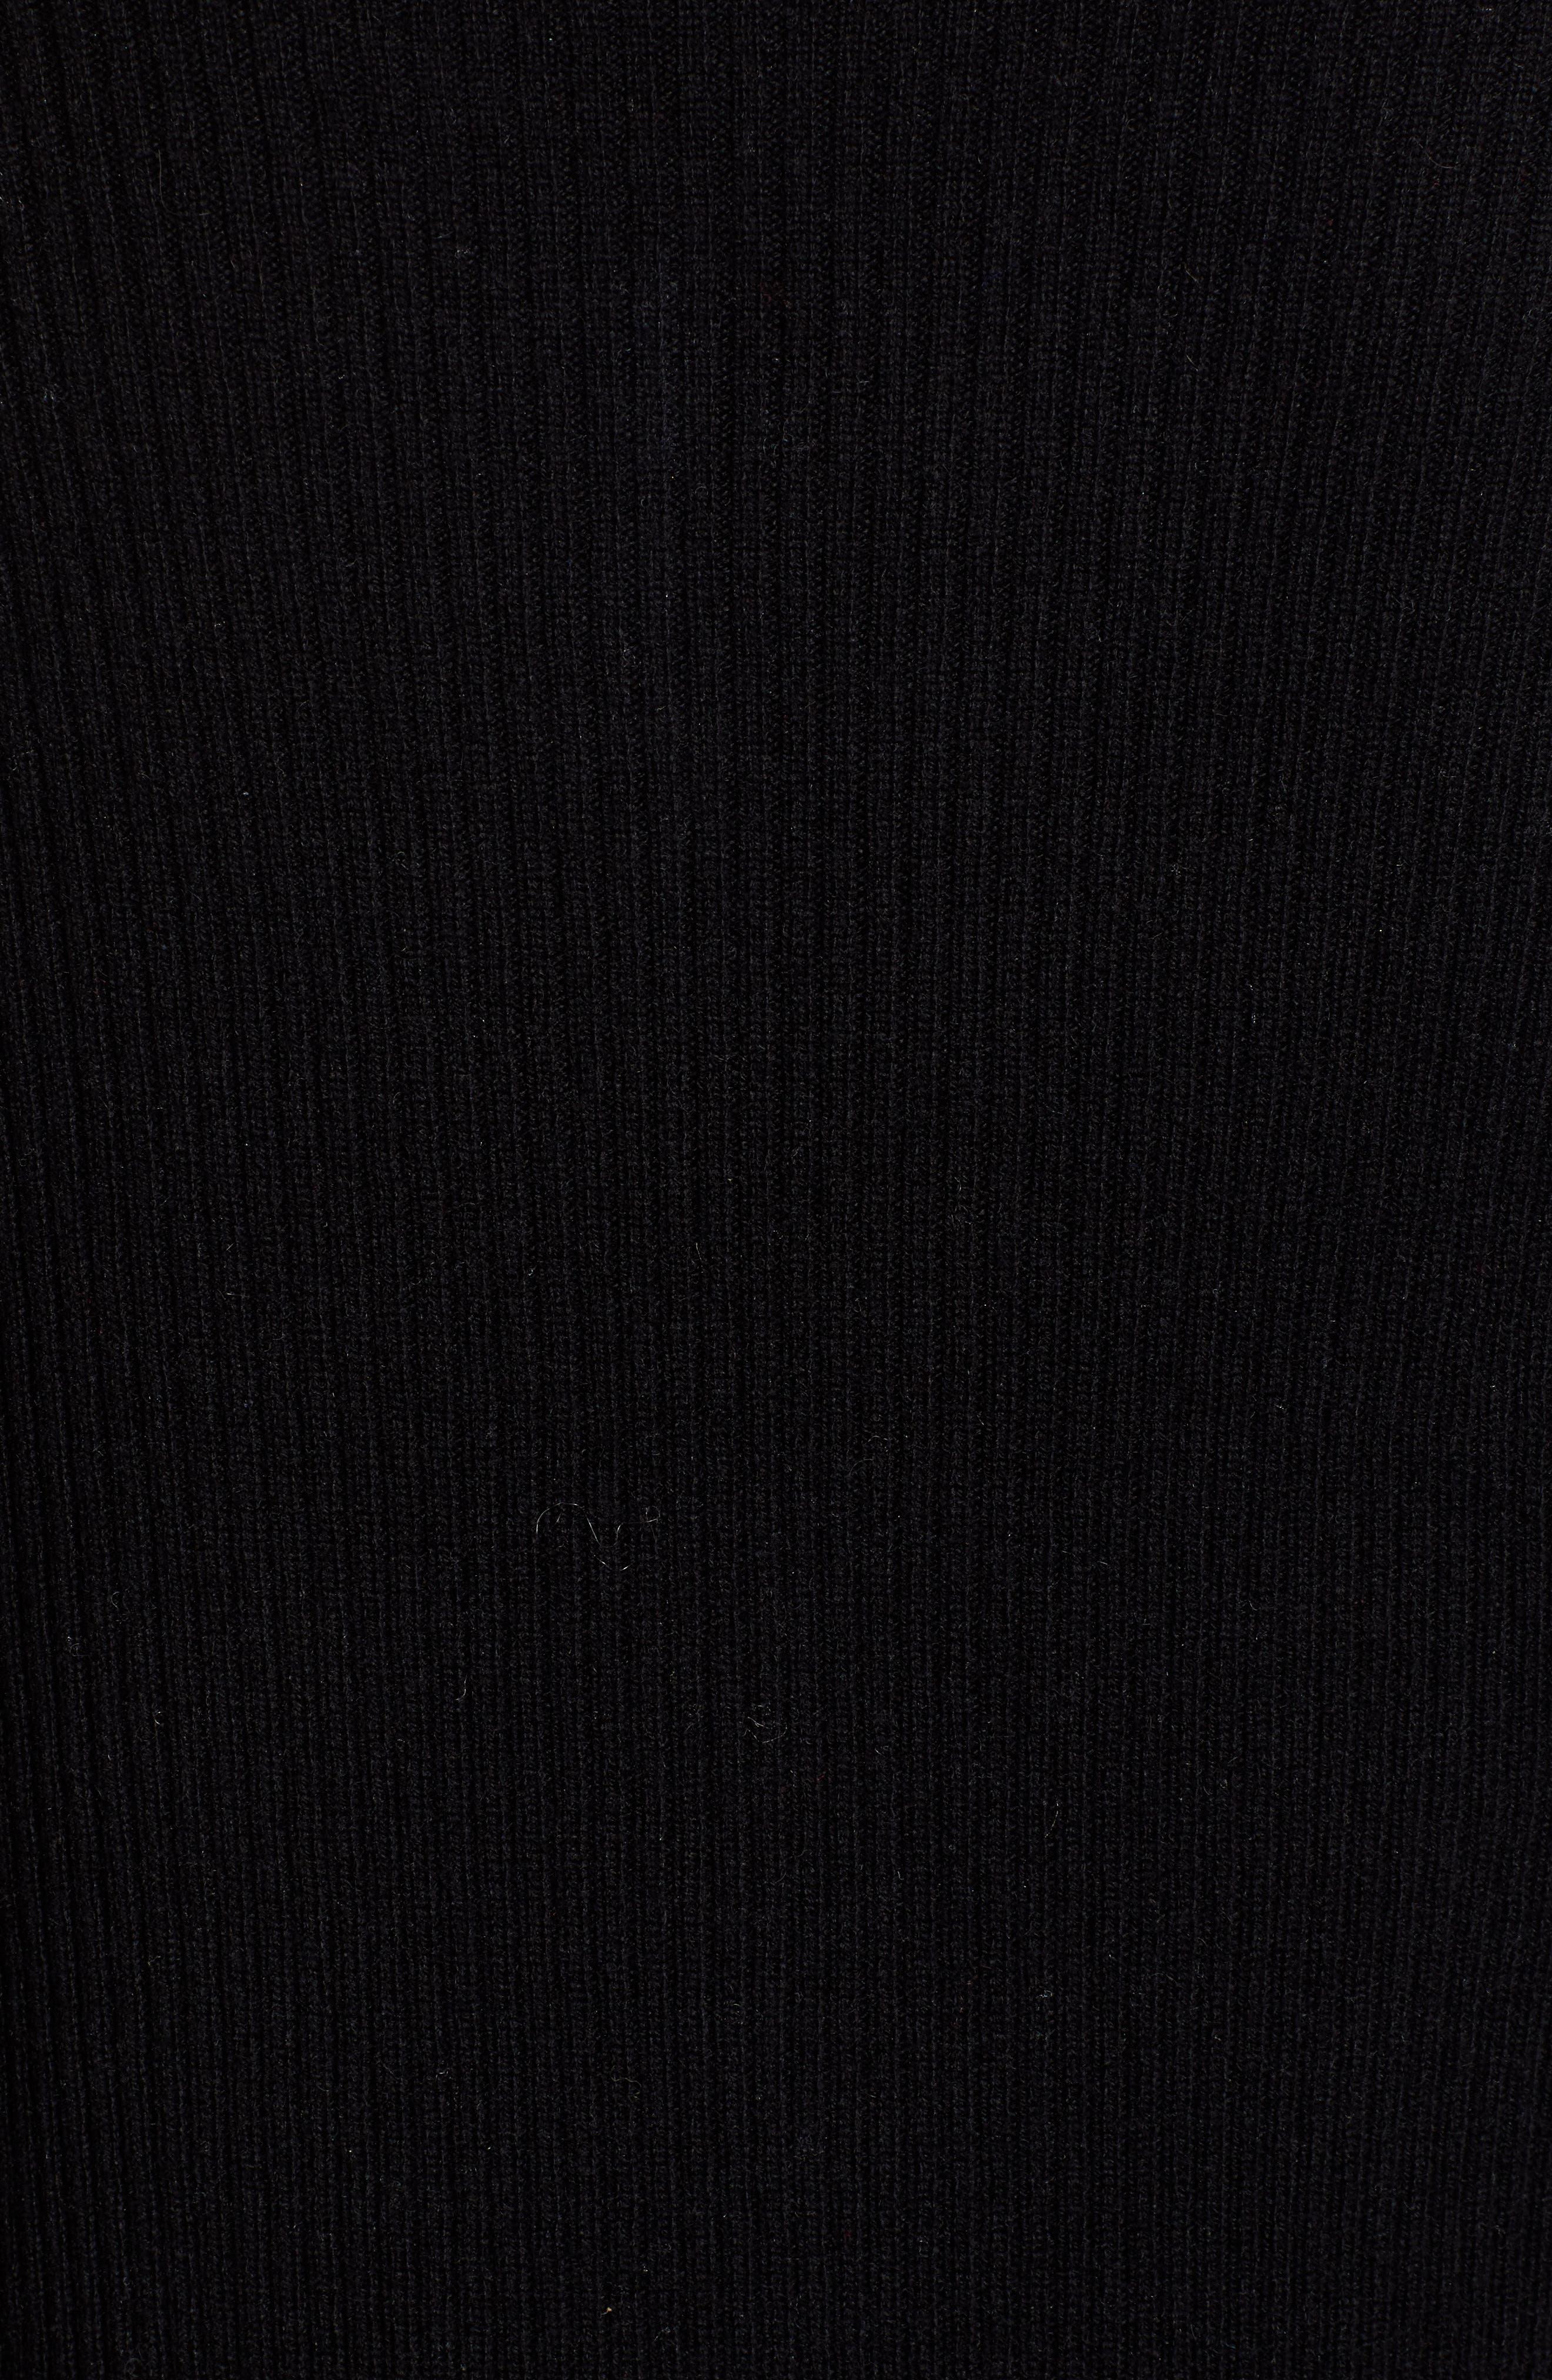 Quaid Knit Sweater Dress,                             Alternate thumbnail 6, color,                             TRUE BLACK